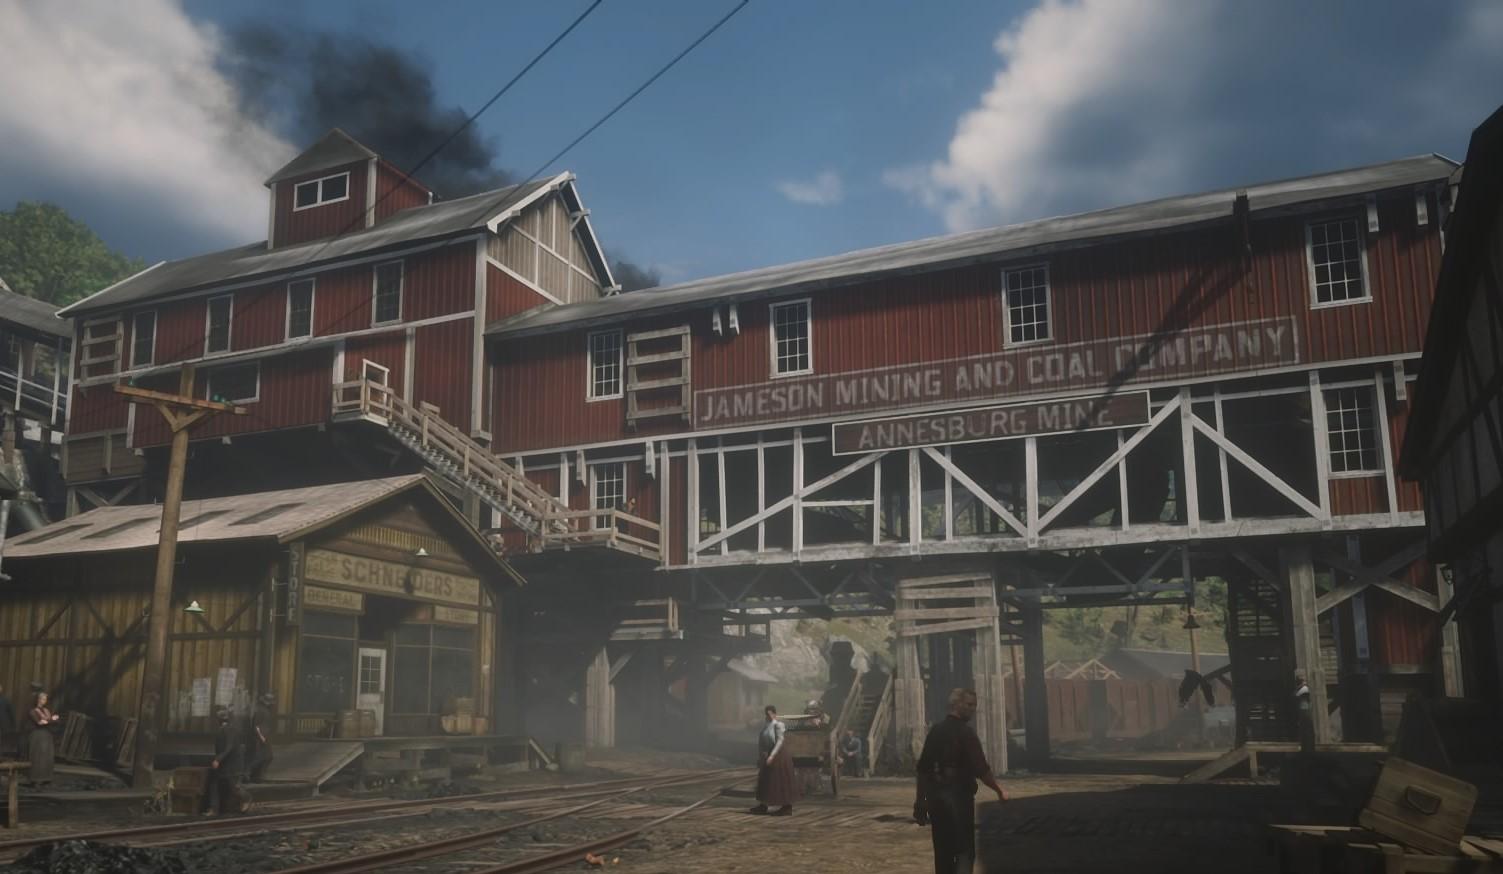 Jameson Mining and Coal Company